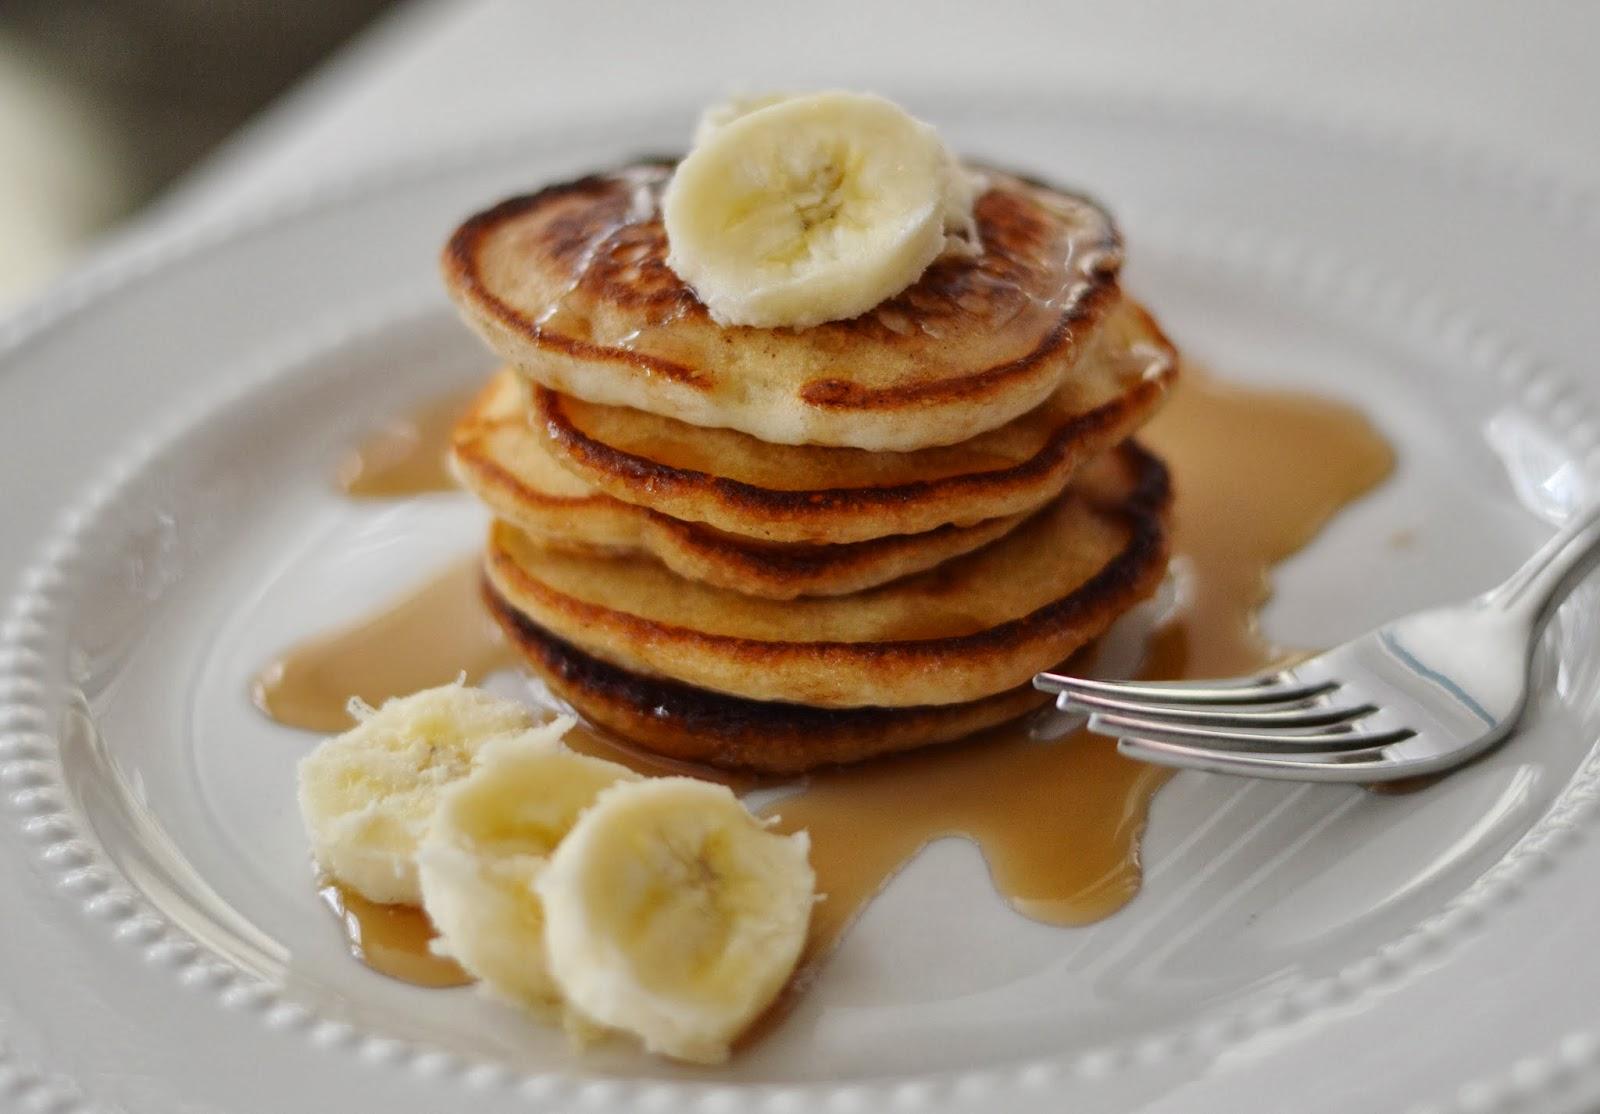 The Art of Comfort Baking: Mini Banana Pancakes